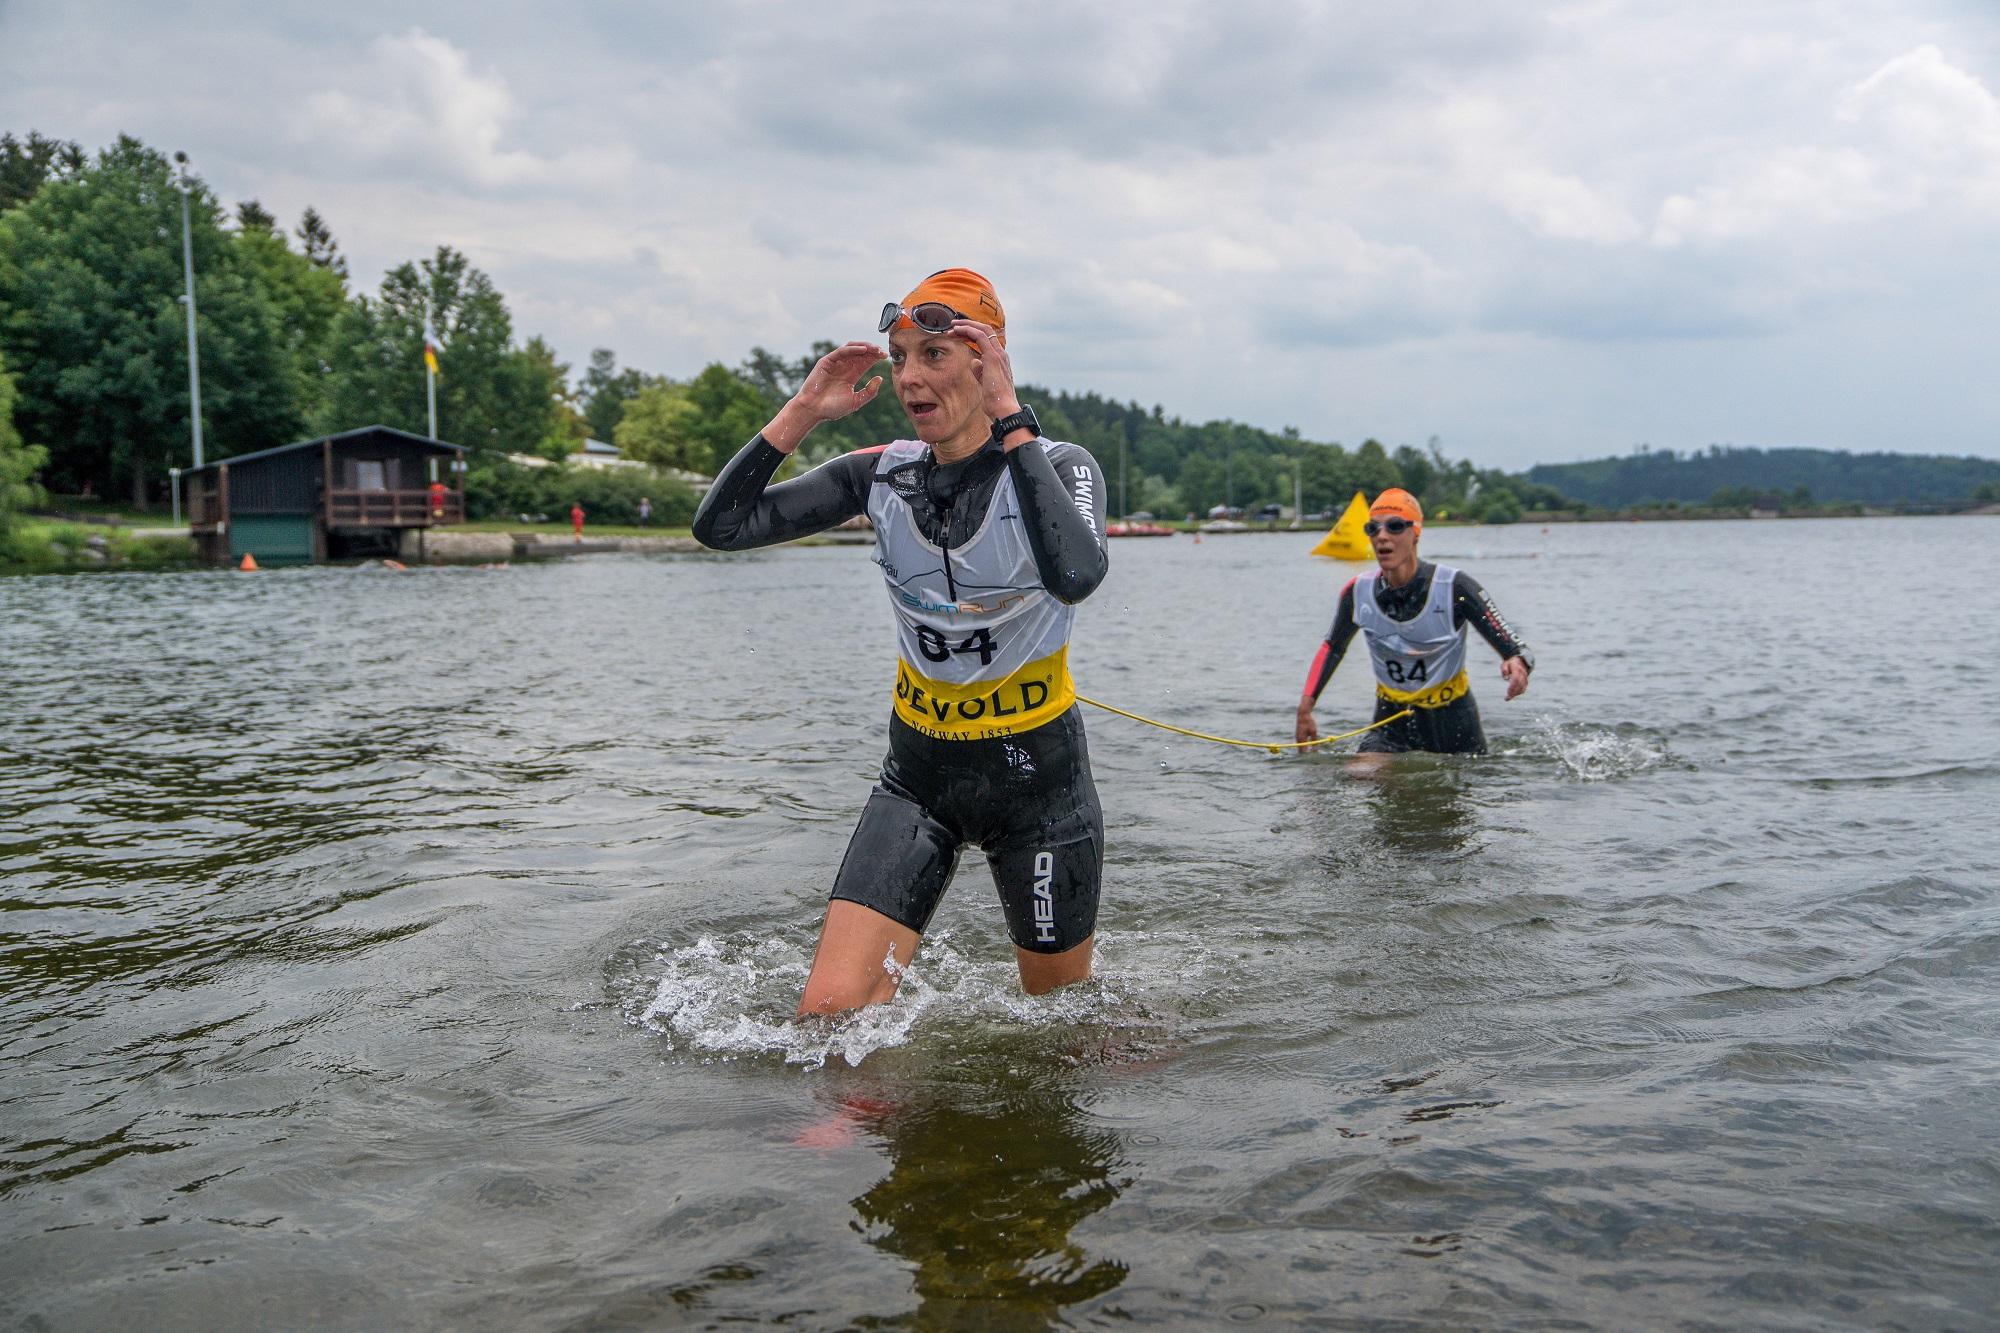 SwimRun Hof 2018 Ambassador Team im Rennen - Foto: Jochen Bake